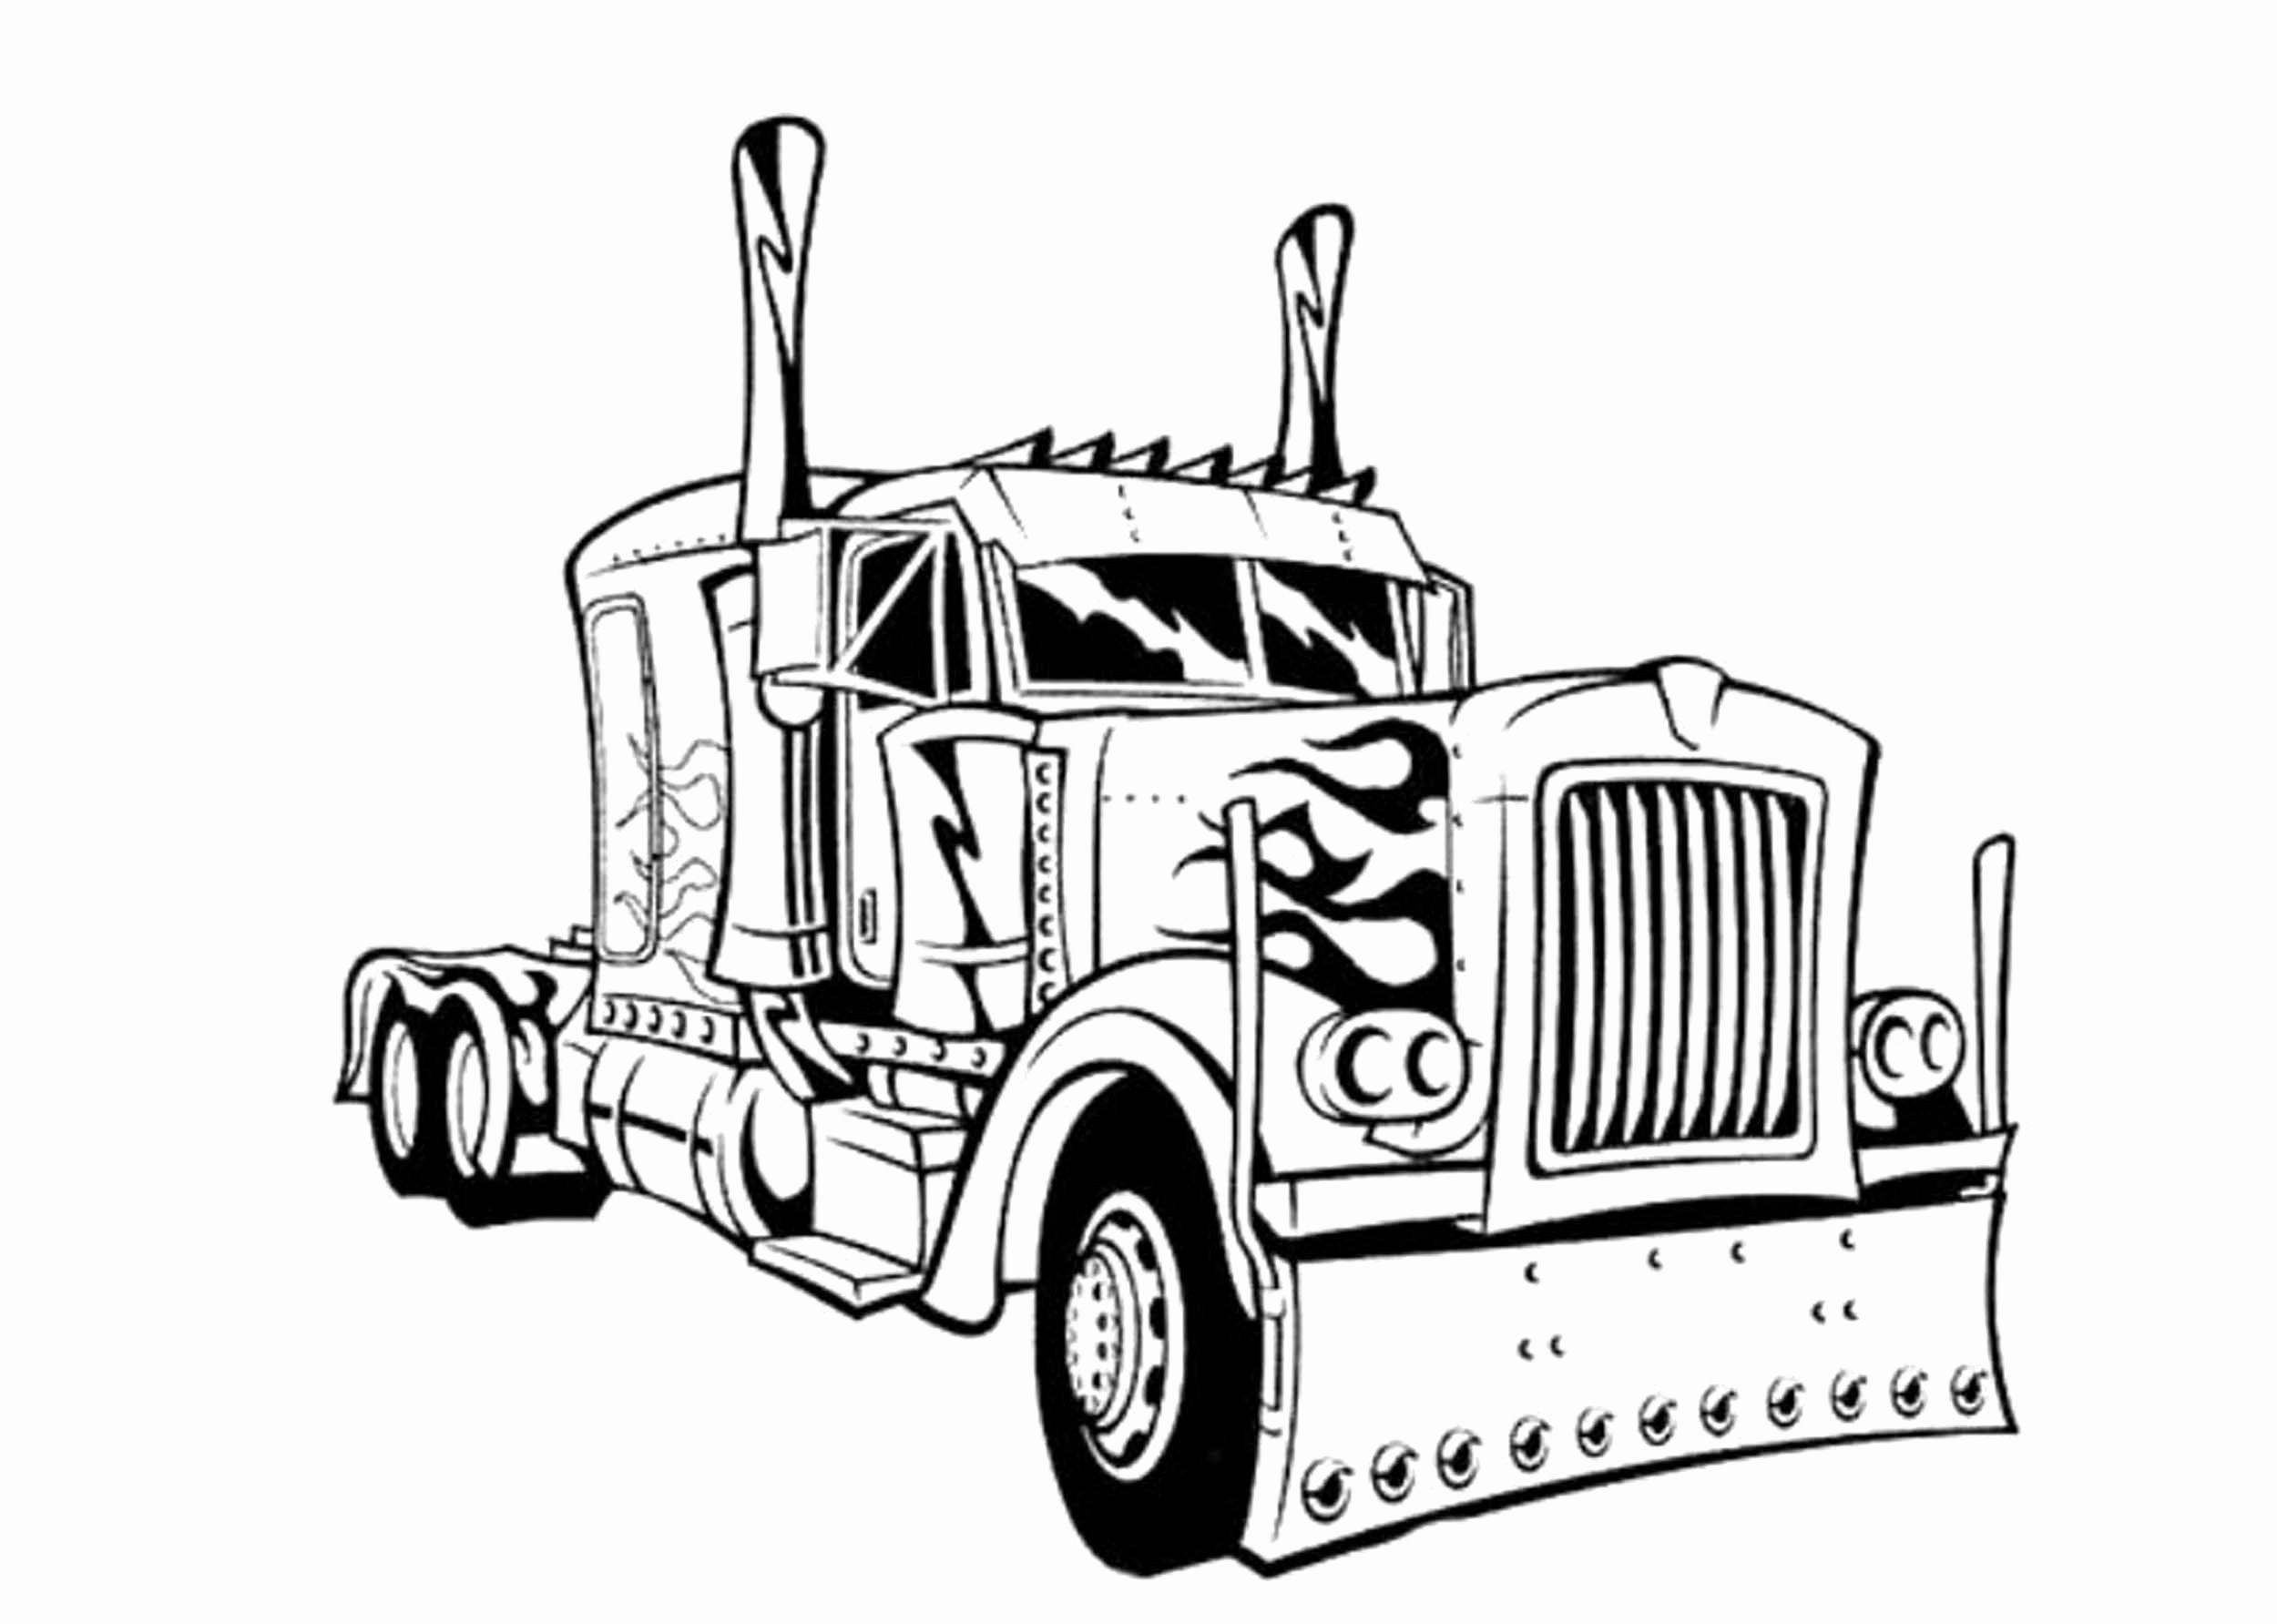 Semi Truck Coloring Sheets Free Printable Coloring Truck Coloring Pages Monster Truck Coloring Pages Transformers Coloring Pages